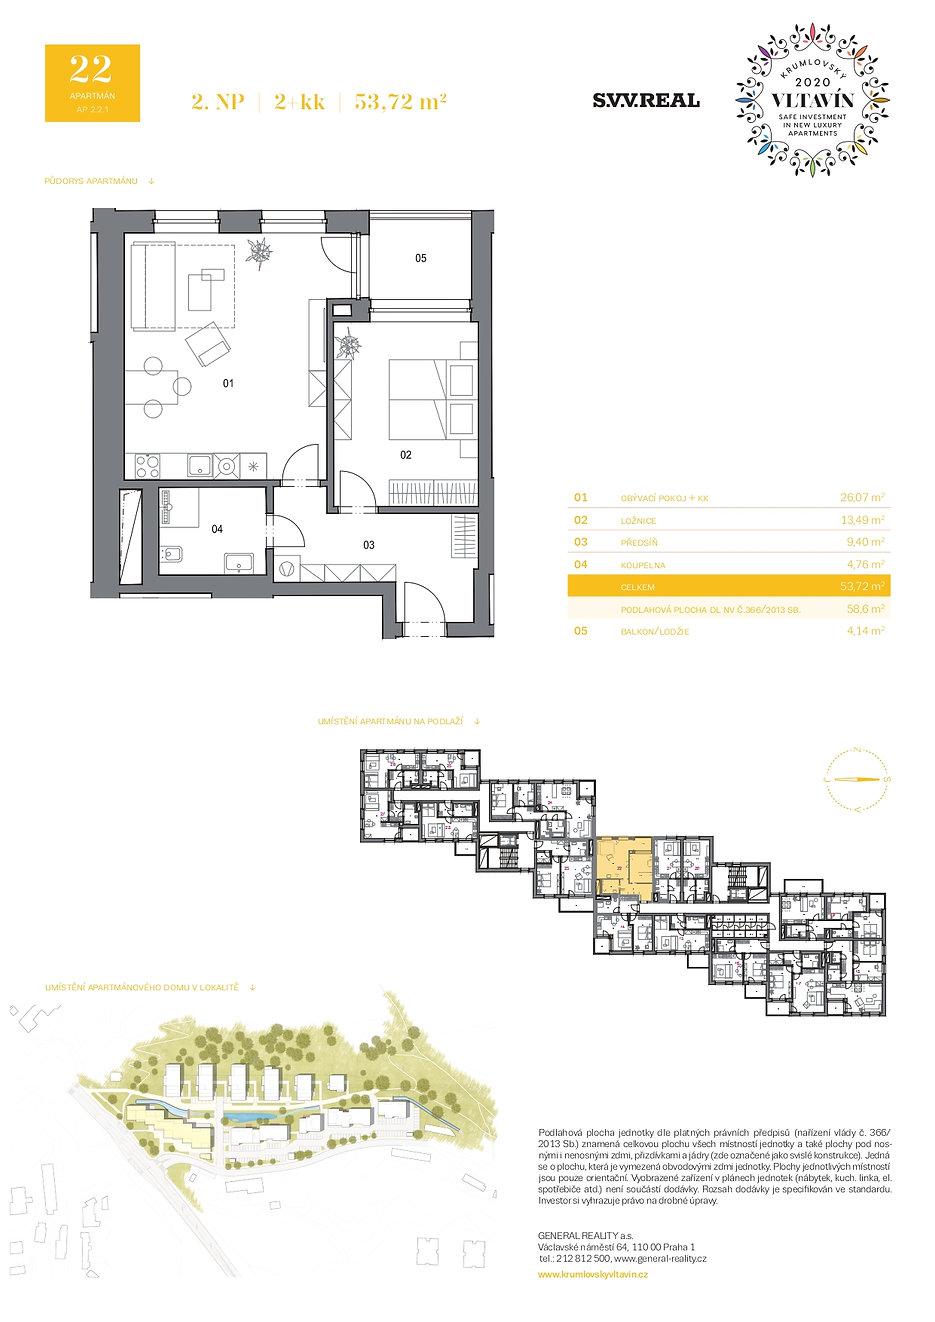 GR_krumlovsky-vltavin_bytove-karty-apartmany_2NP_A22_page-0001.jpg